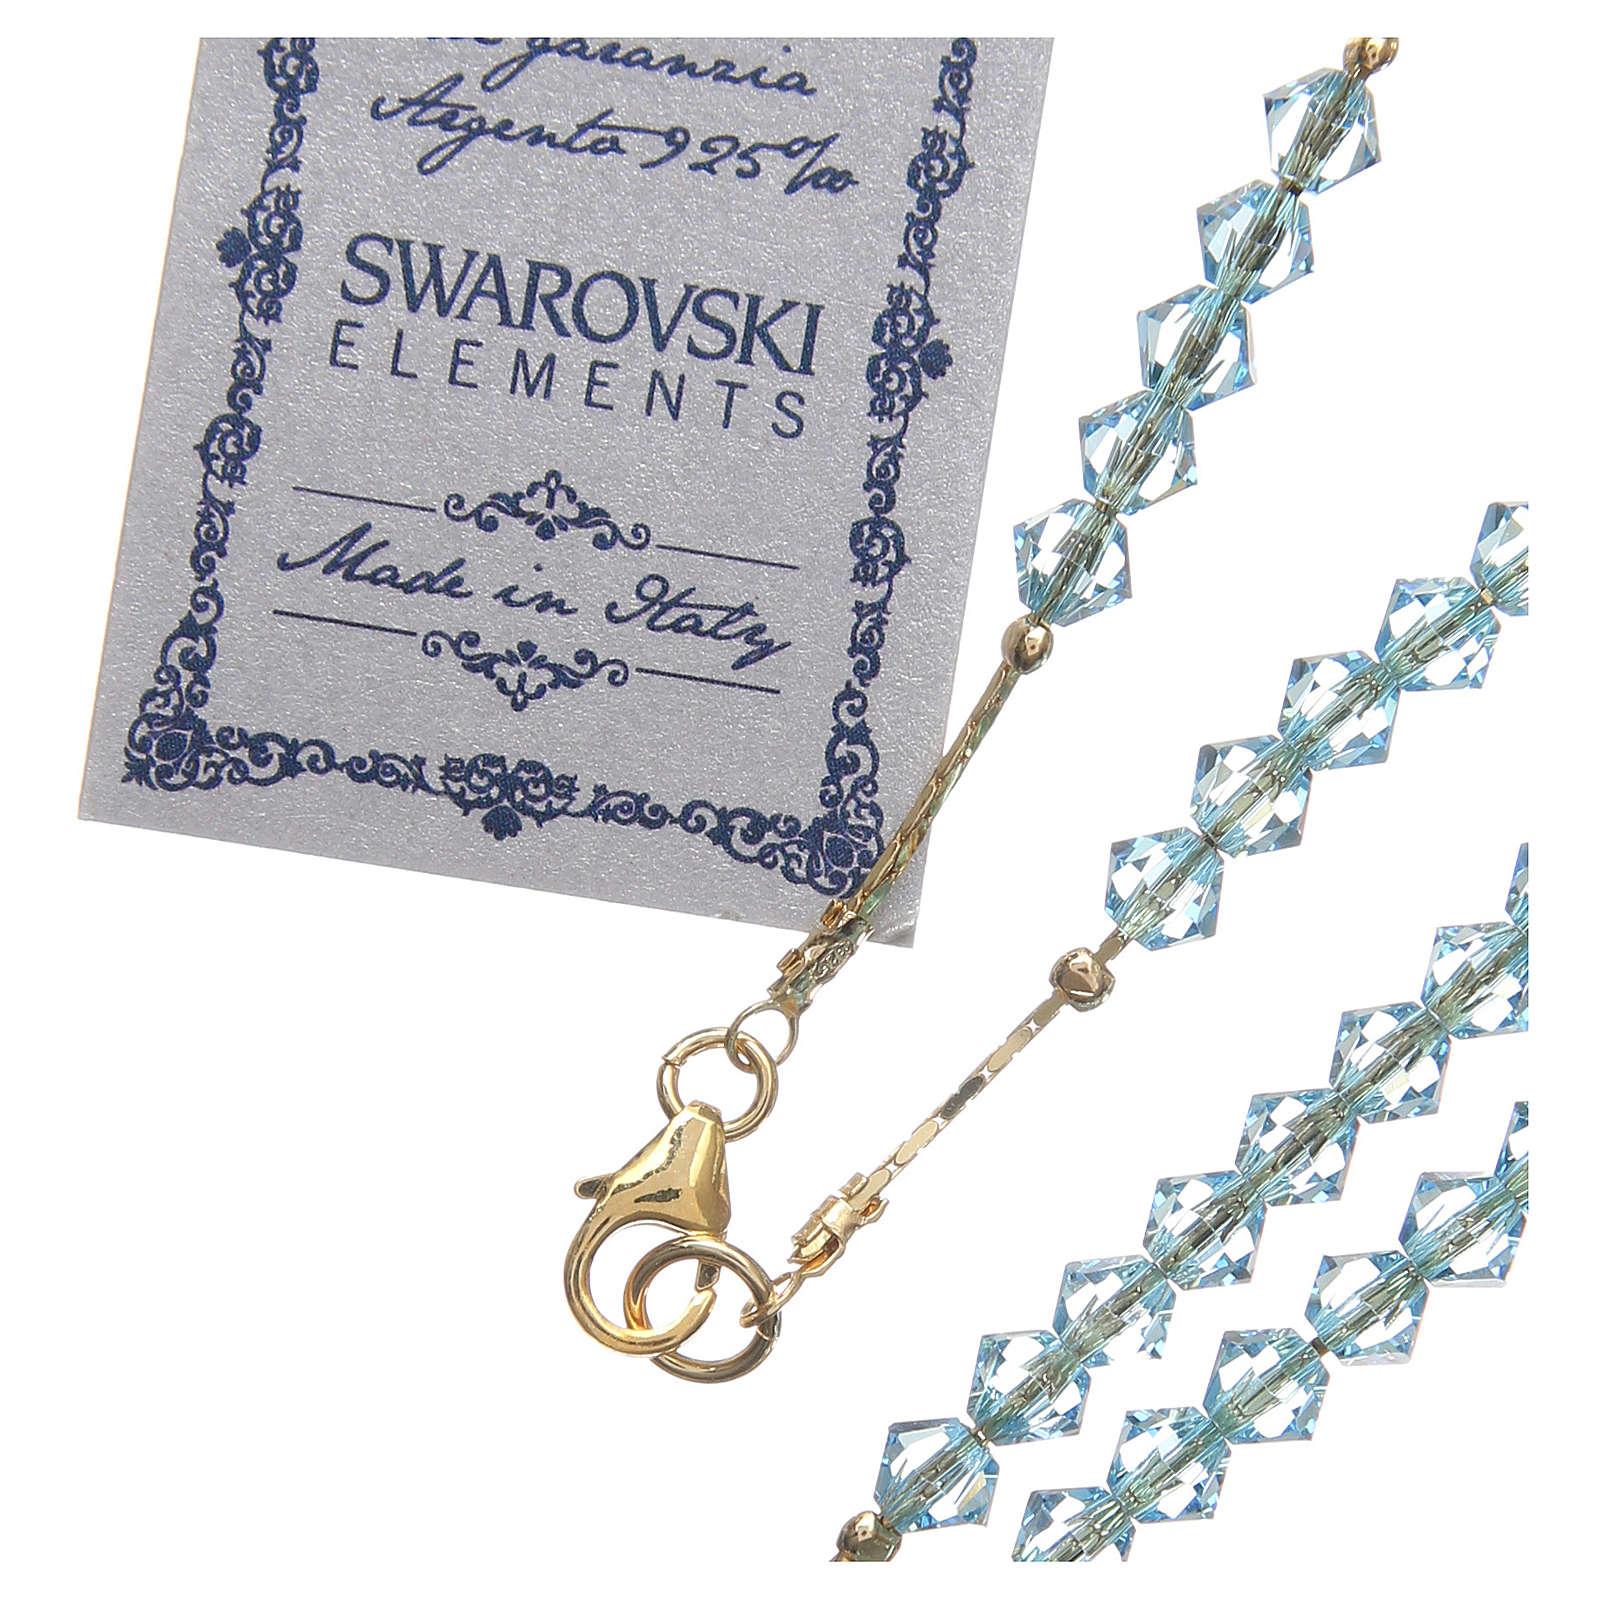 Chapelet Swarovski et argent 925 doré 4 mm bleu ciel 4